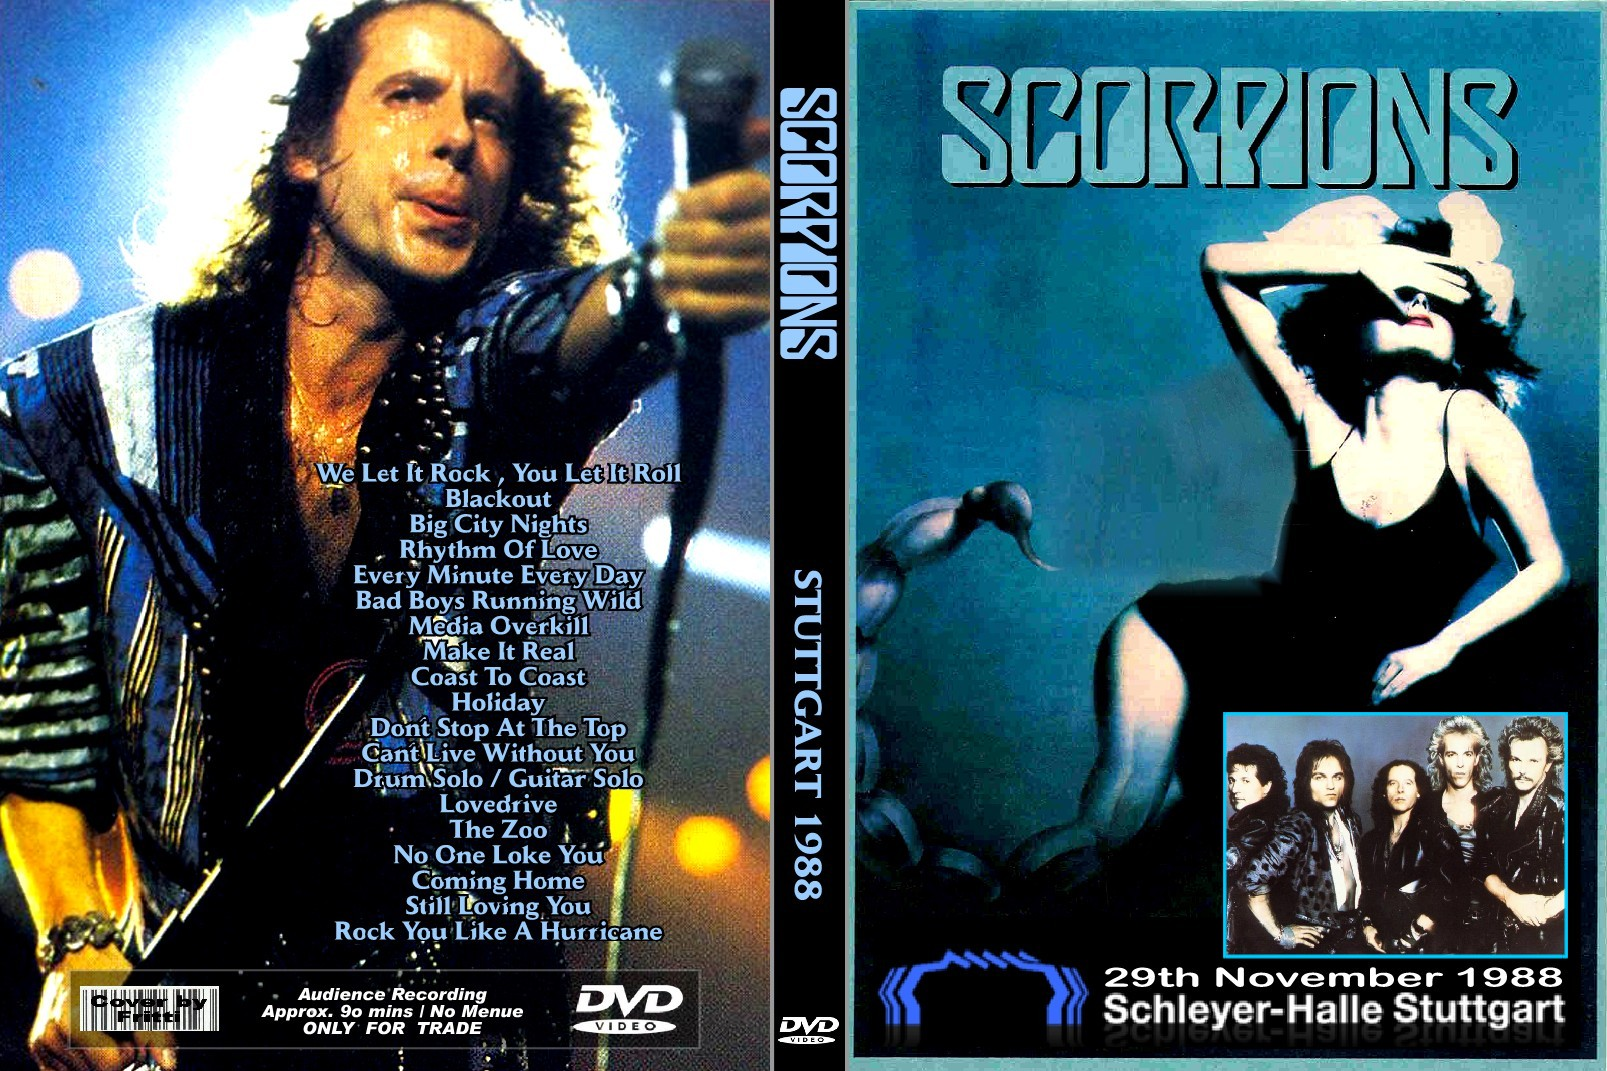 Scorpions - Savage Amusement (1988) Review - YouTube